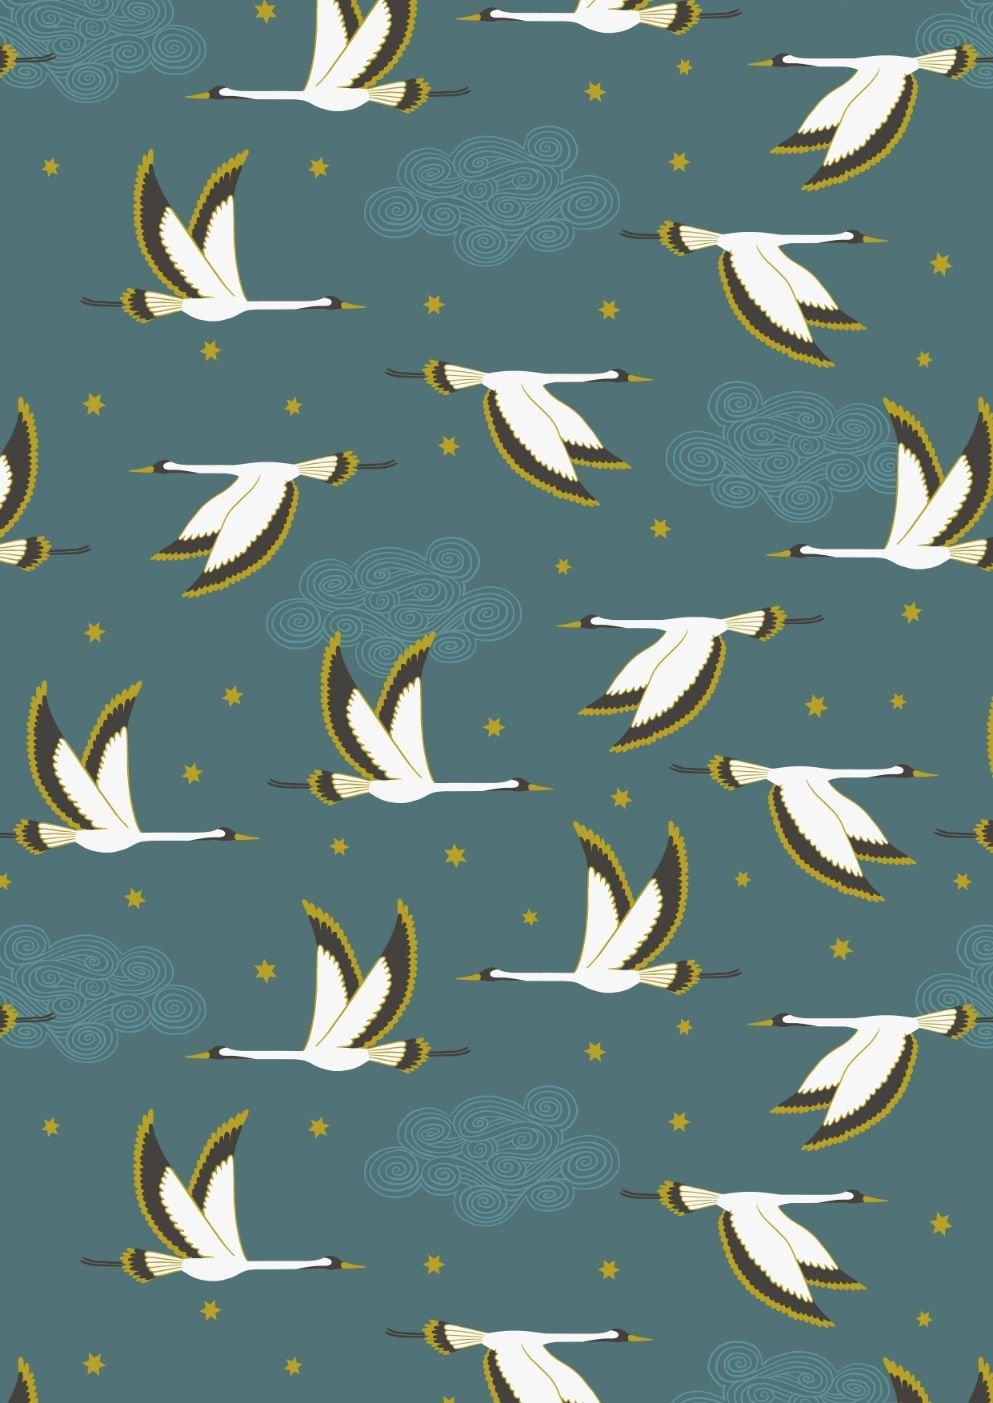 Jardin de Lis by Lewis & Irene - Flying Heron on Jade with Gold Metallic